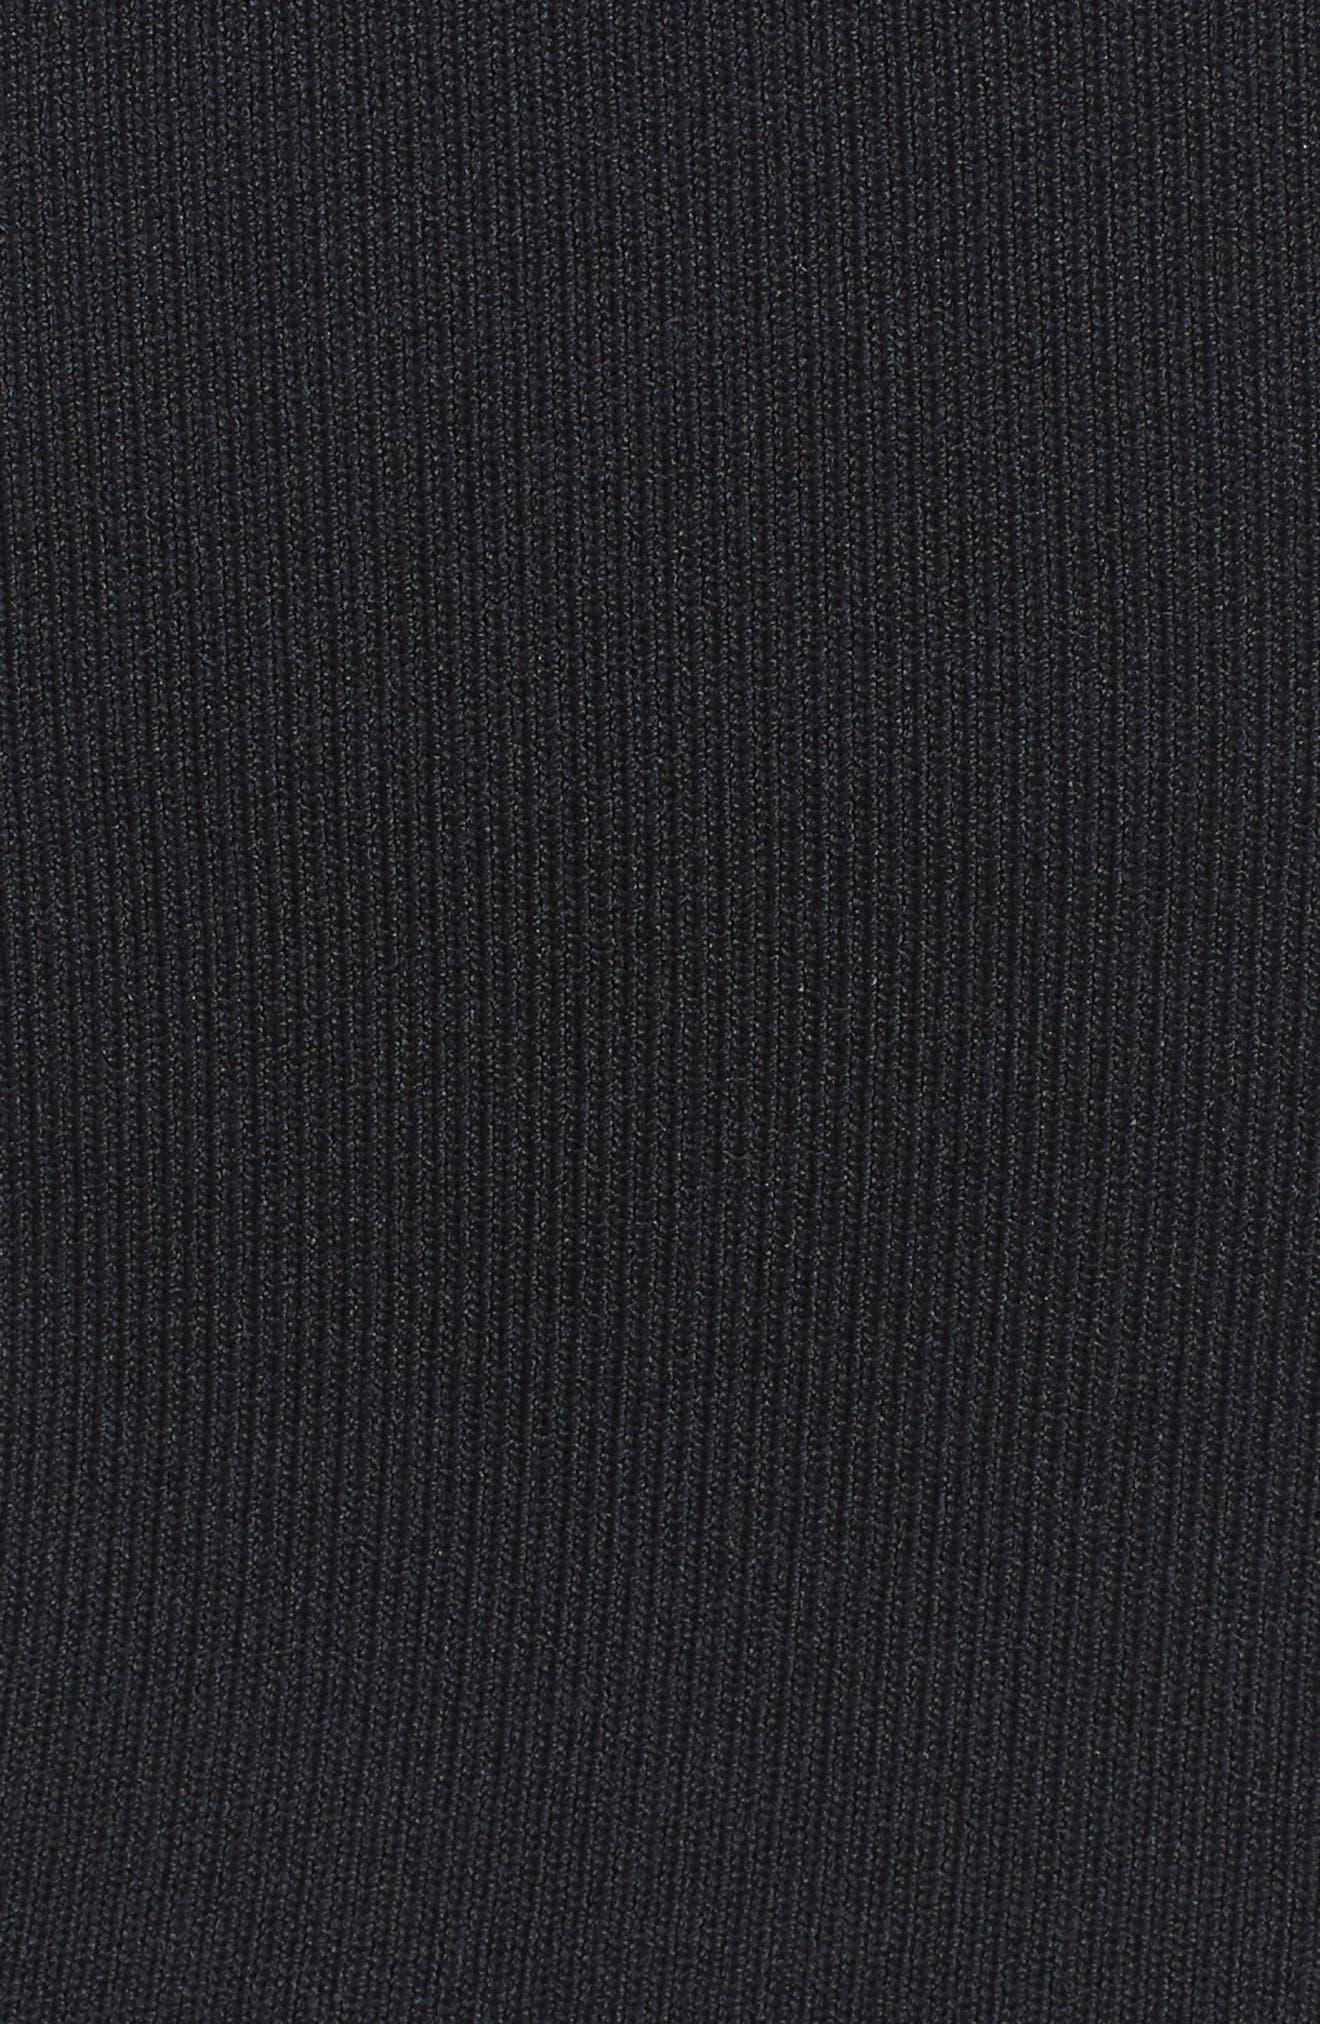 Bishop + Young Siena Peekaboo Skirt,                             Alternate thumbnail 5, color,                             Black